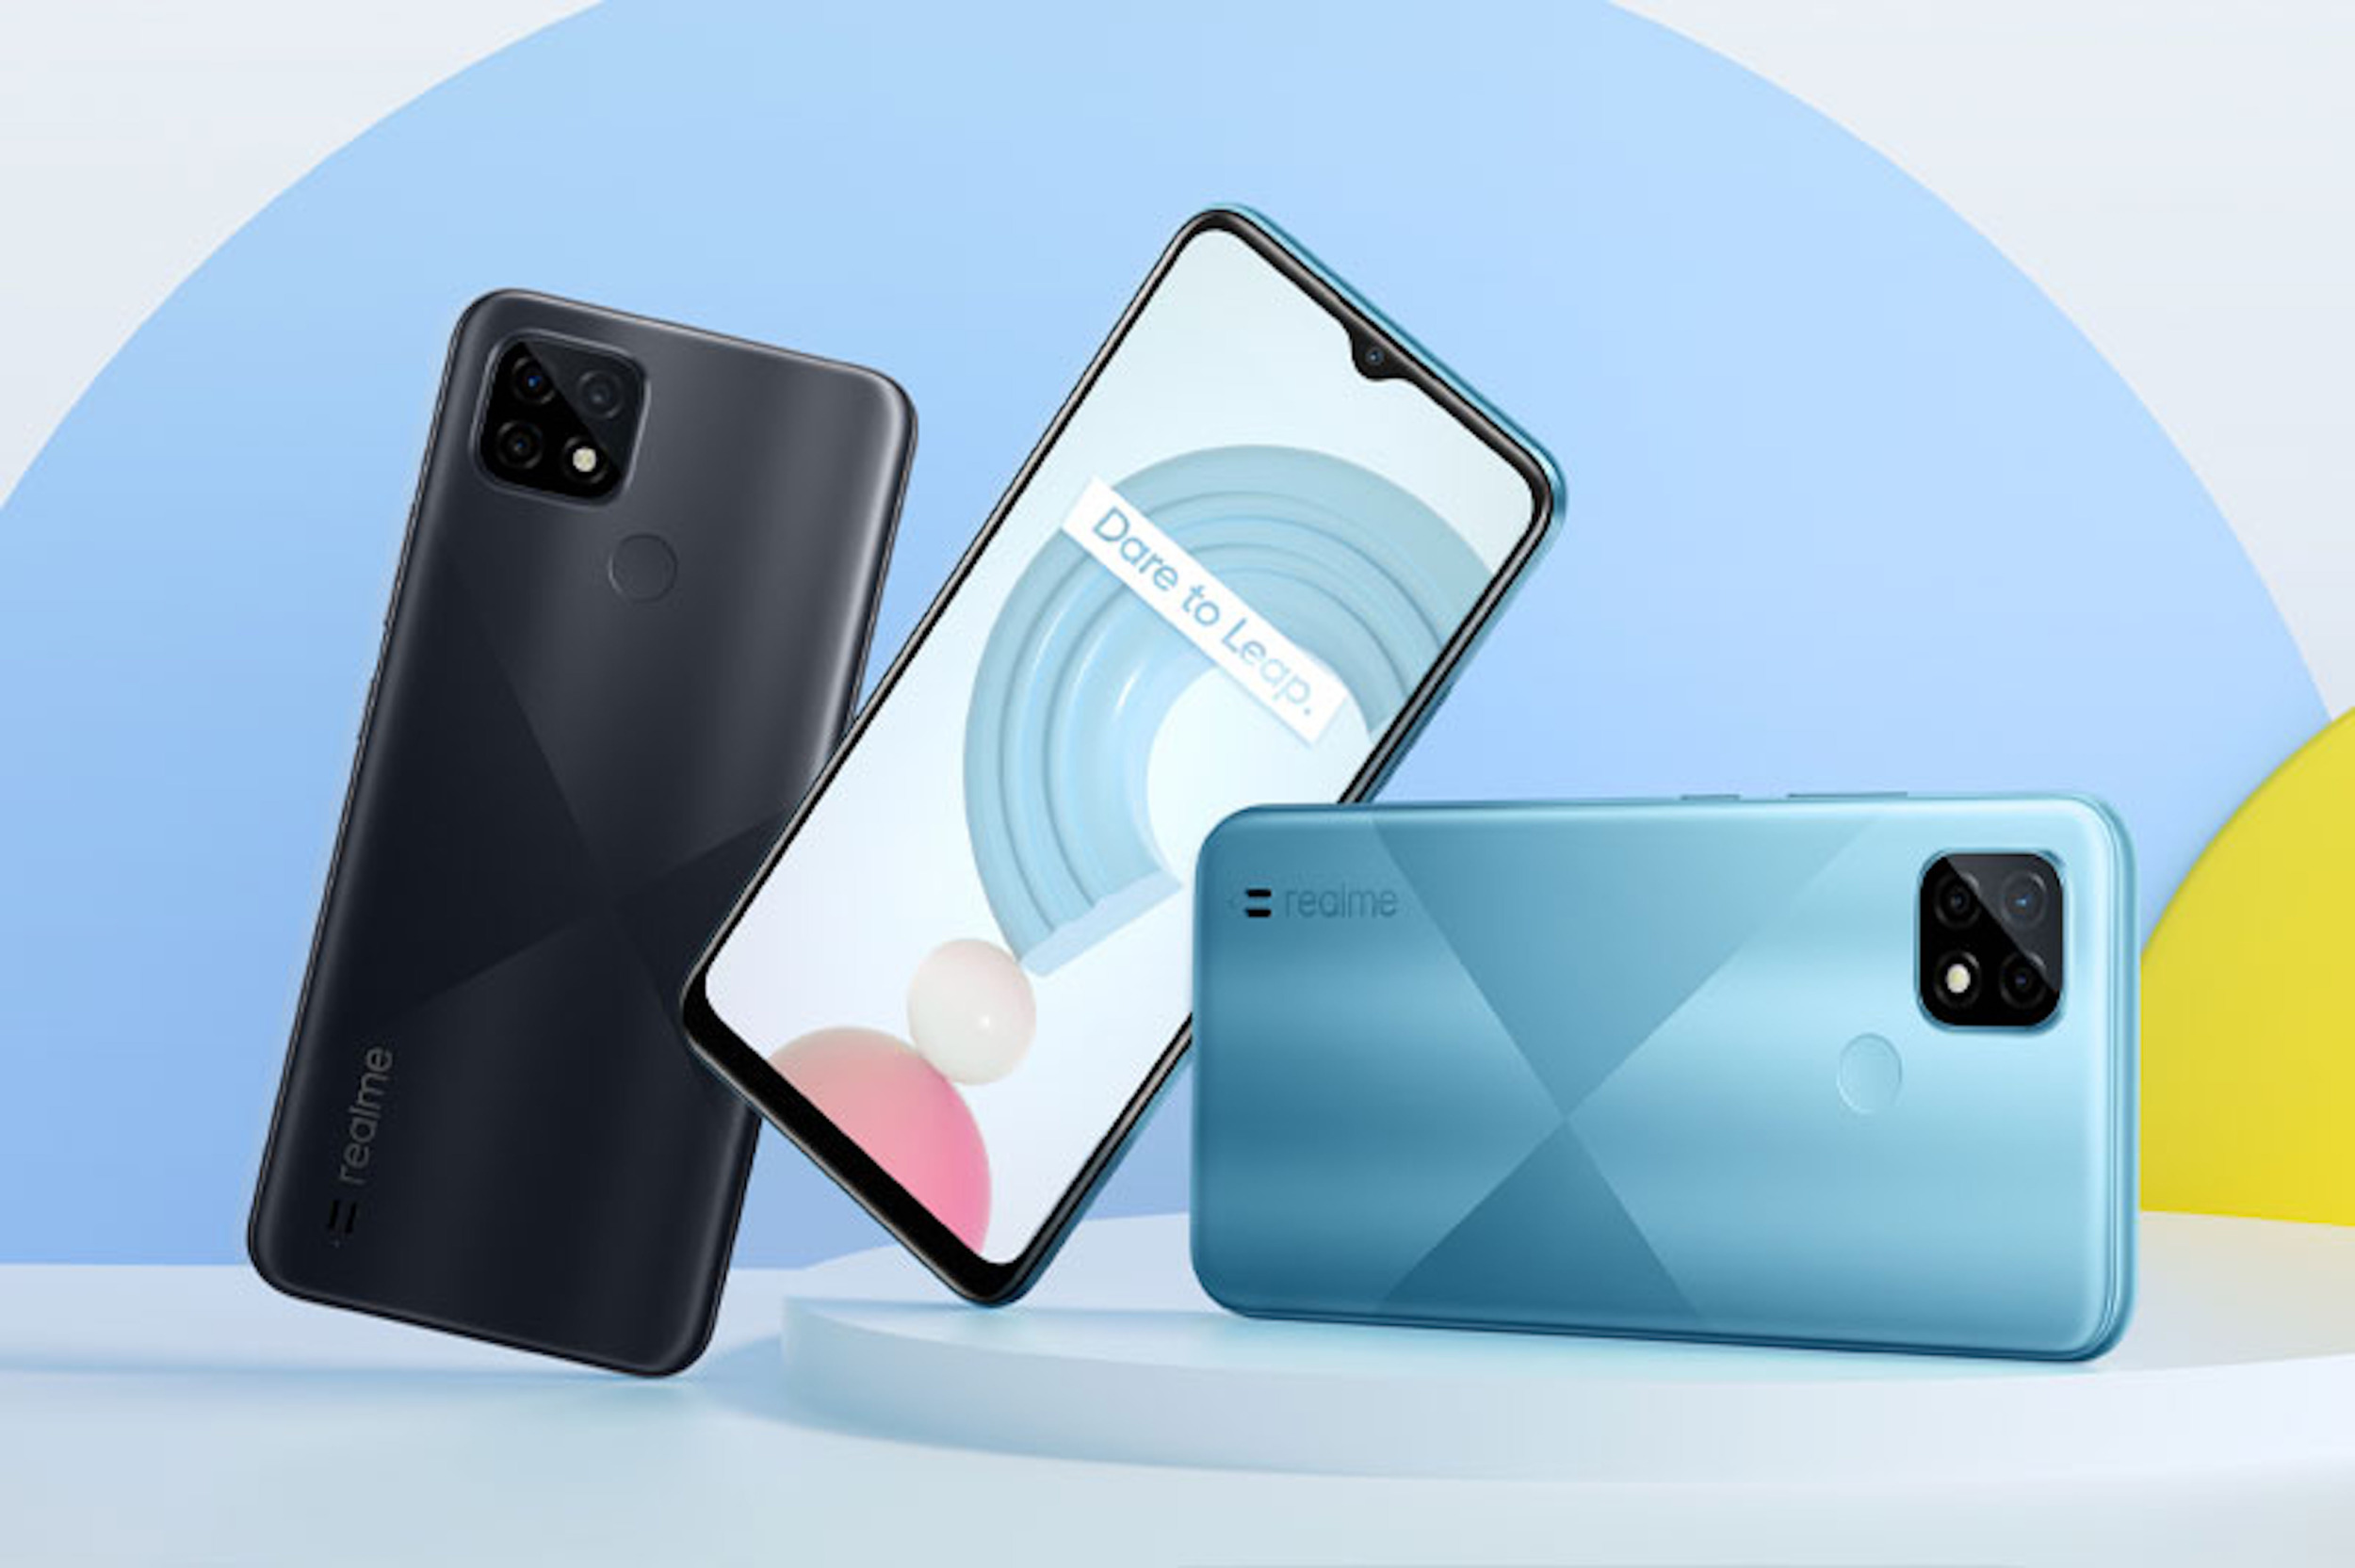 Realme C21Y bude dalším Android Go telefonem